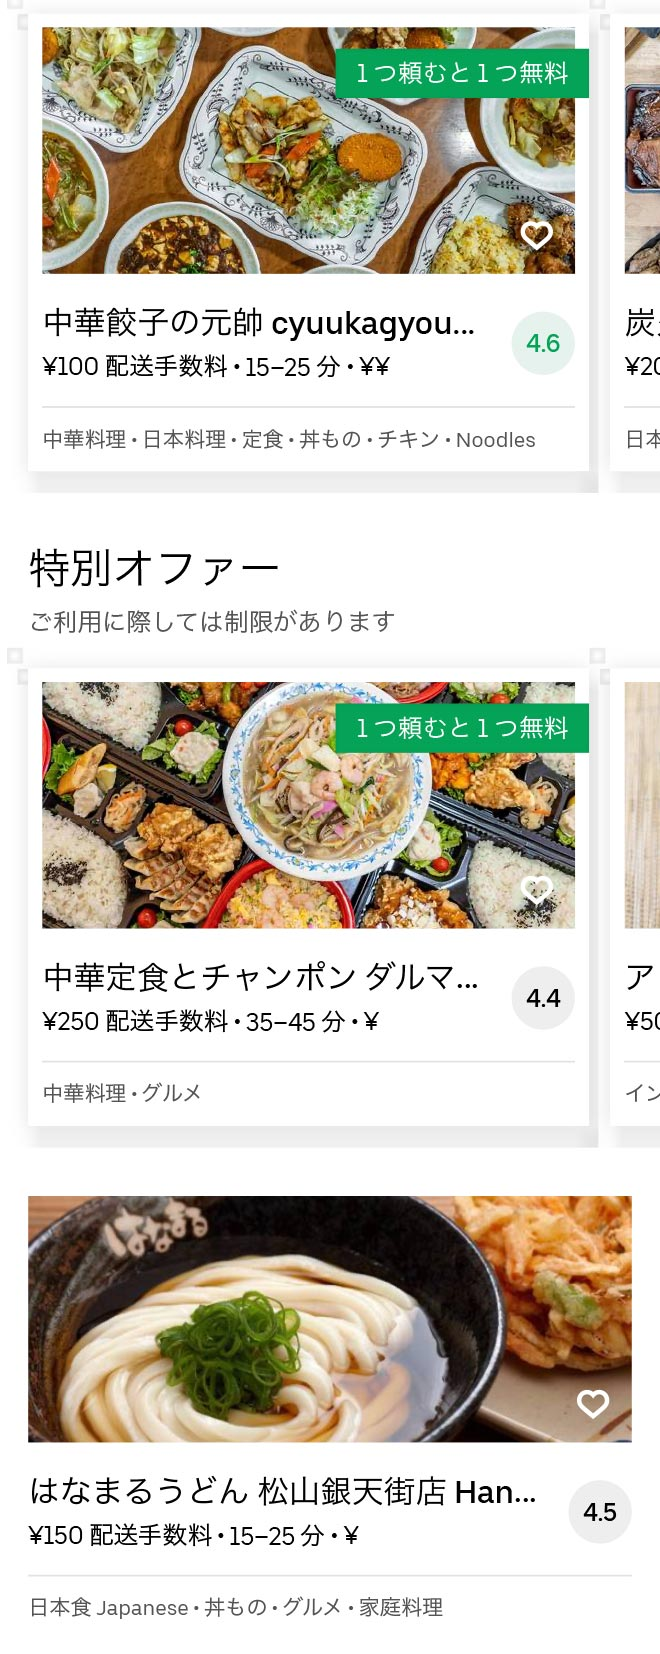 Matsuyama menu 2010 02